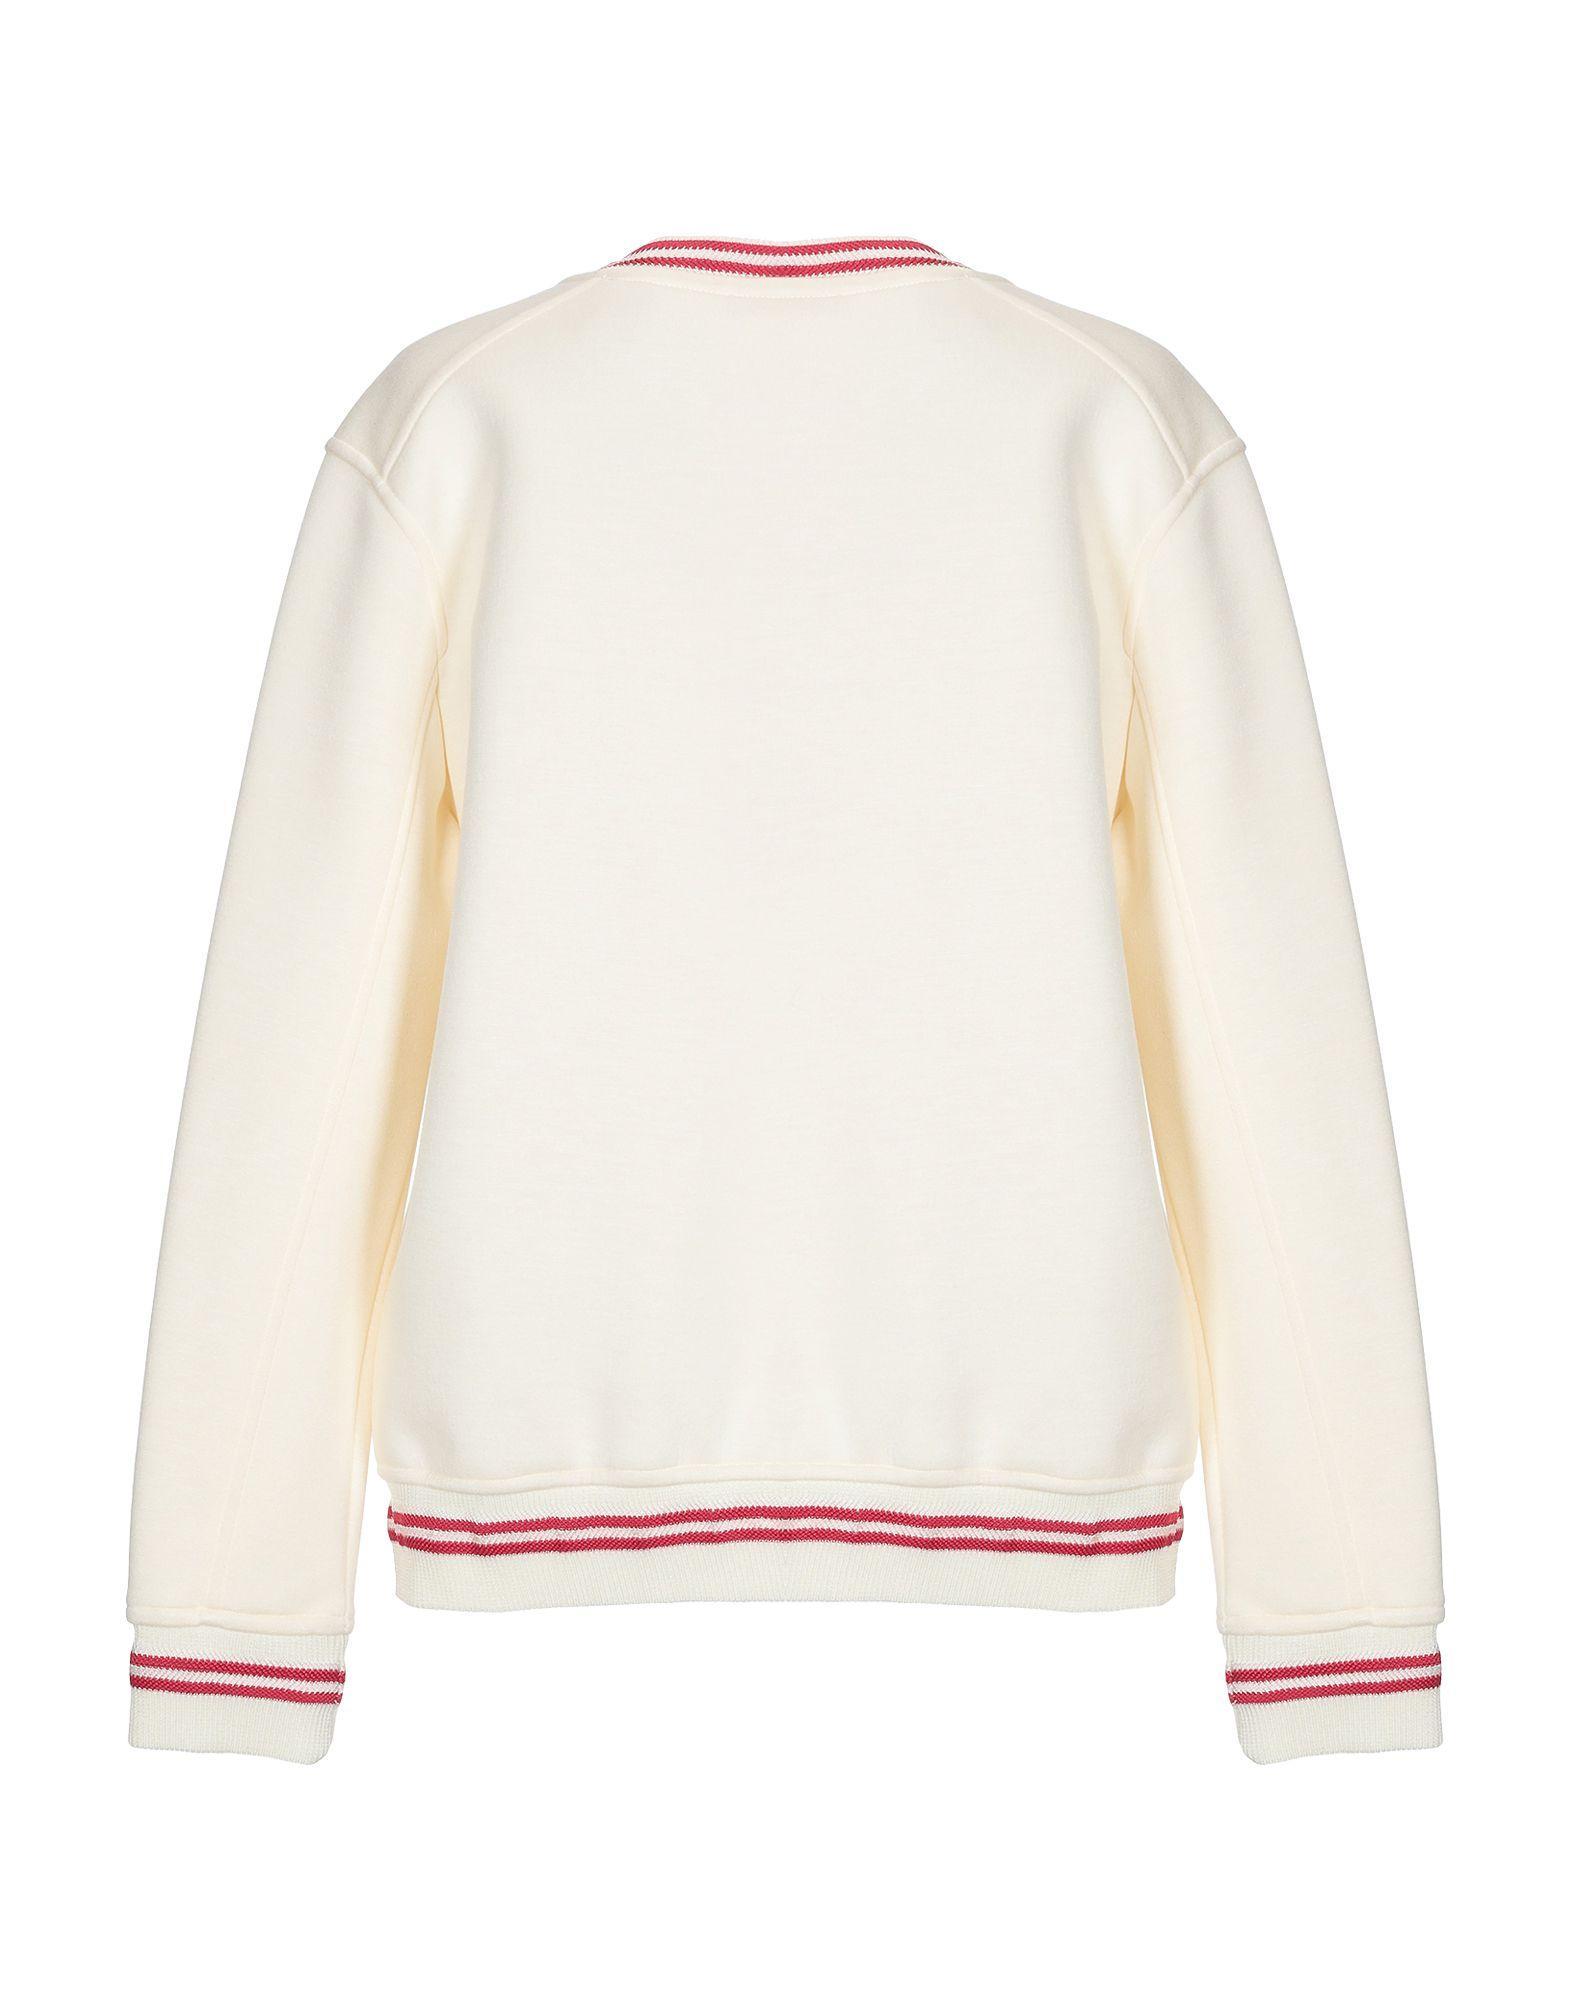 0191239ffd Lyst - Maje Sweatshirt in White - Save 23%